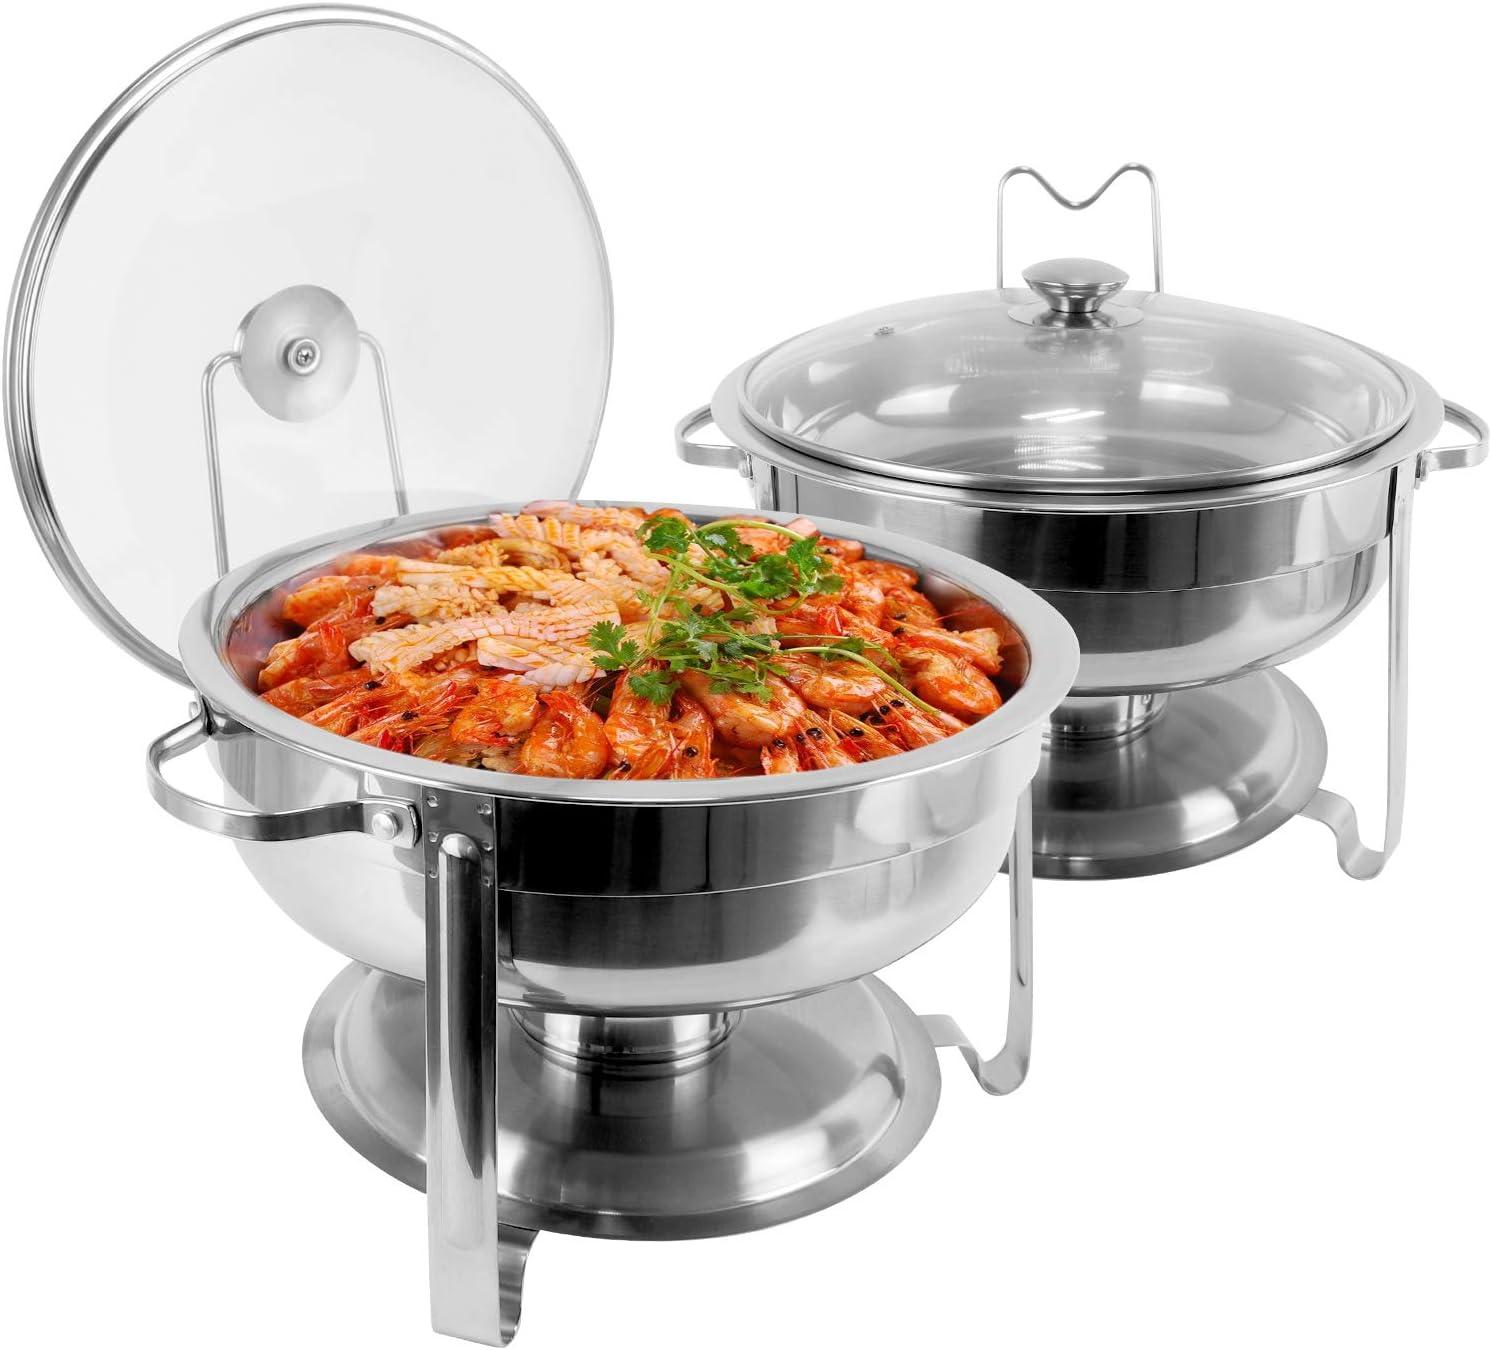 430 Stainless Elegant Steel Chafing Cheap Dish Buffet Round Buffe Quart Set 4